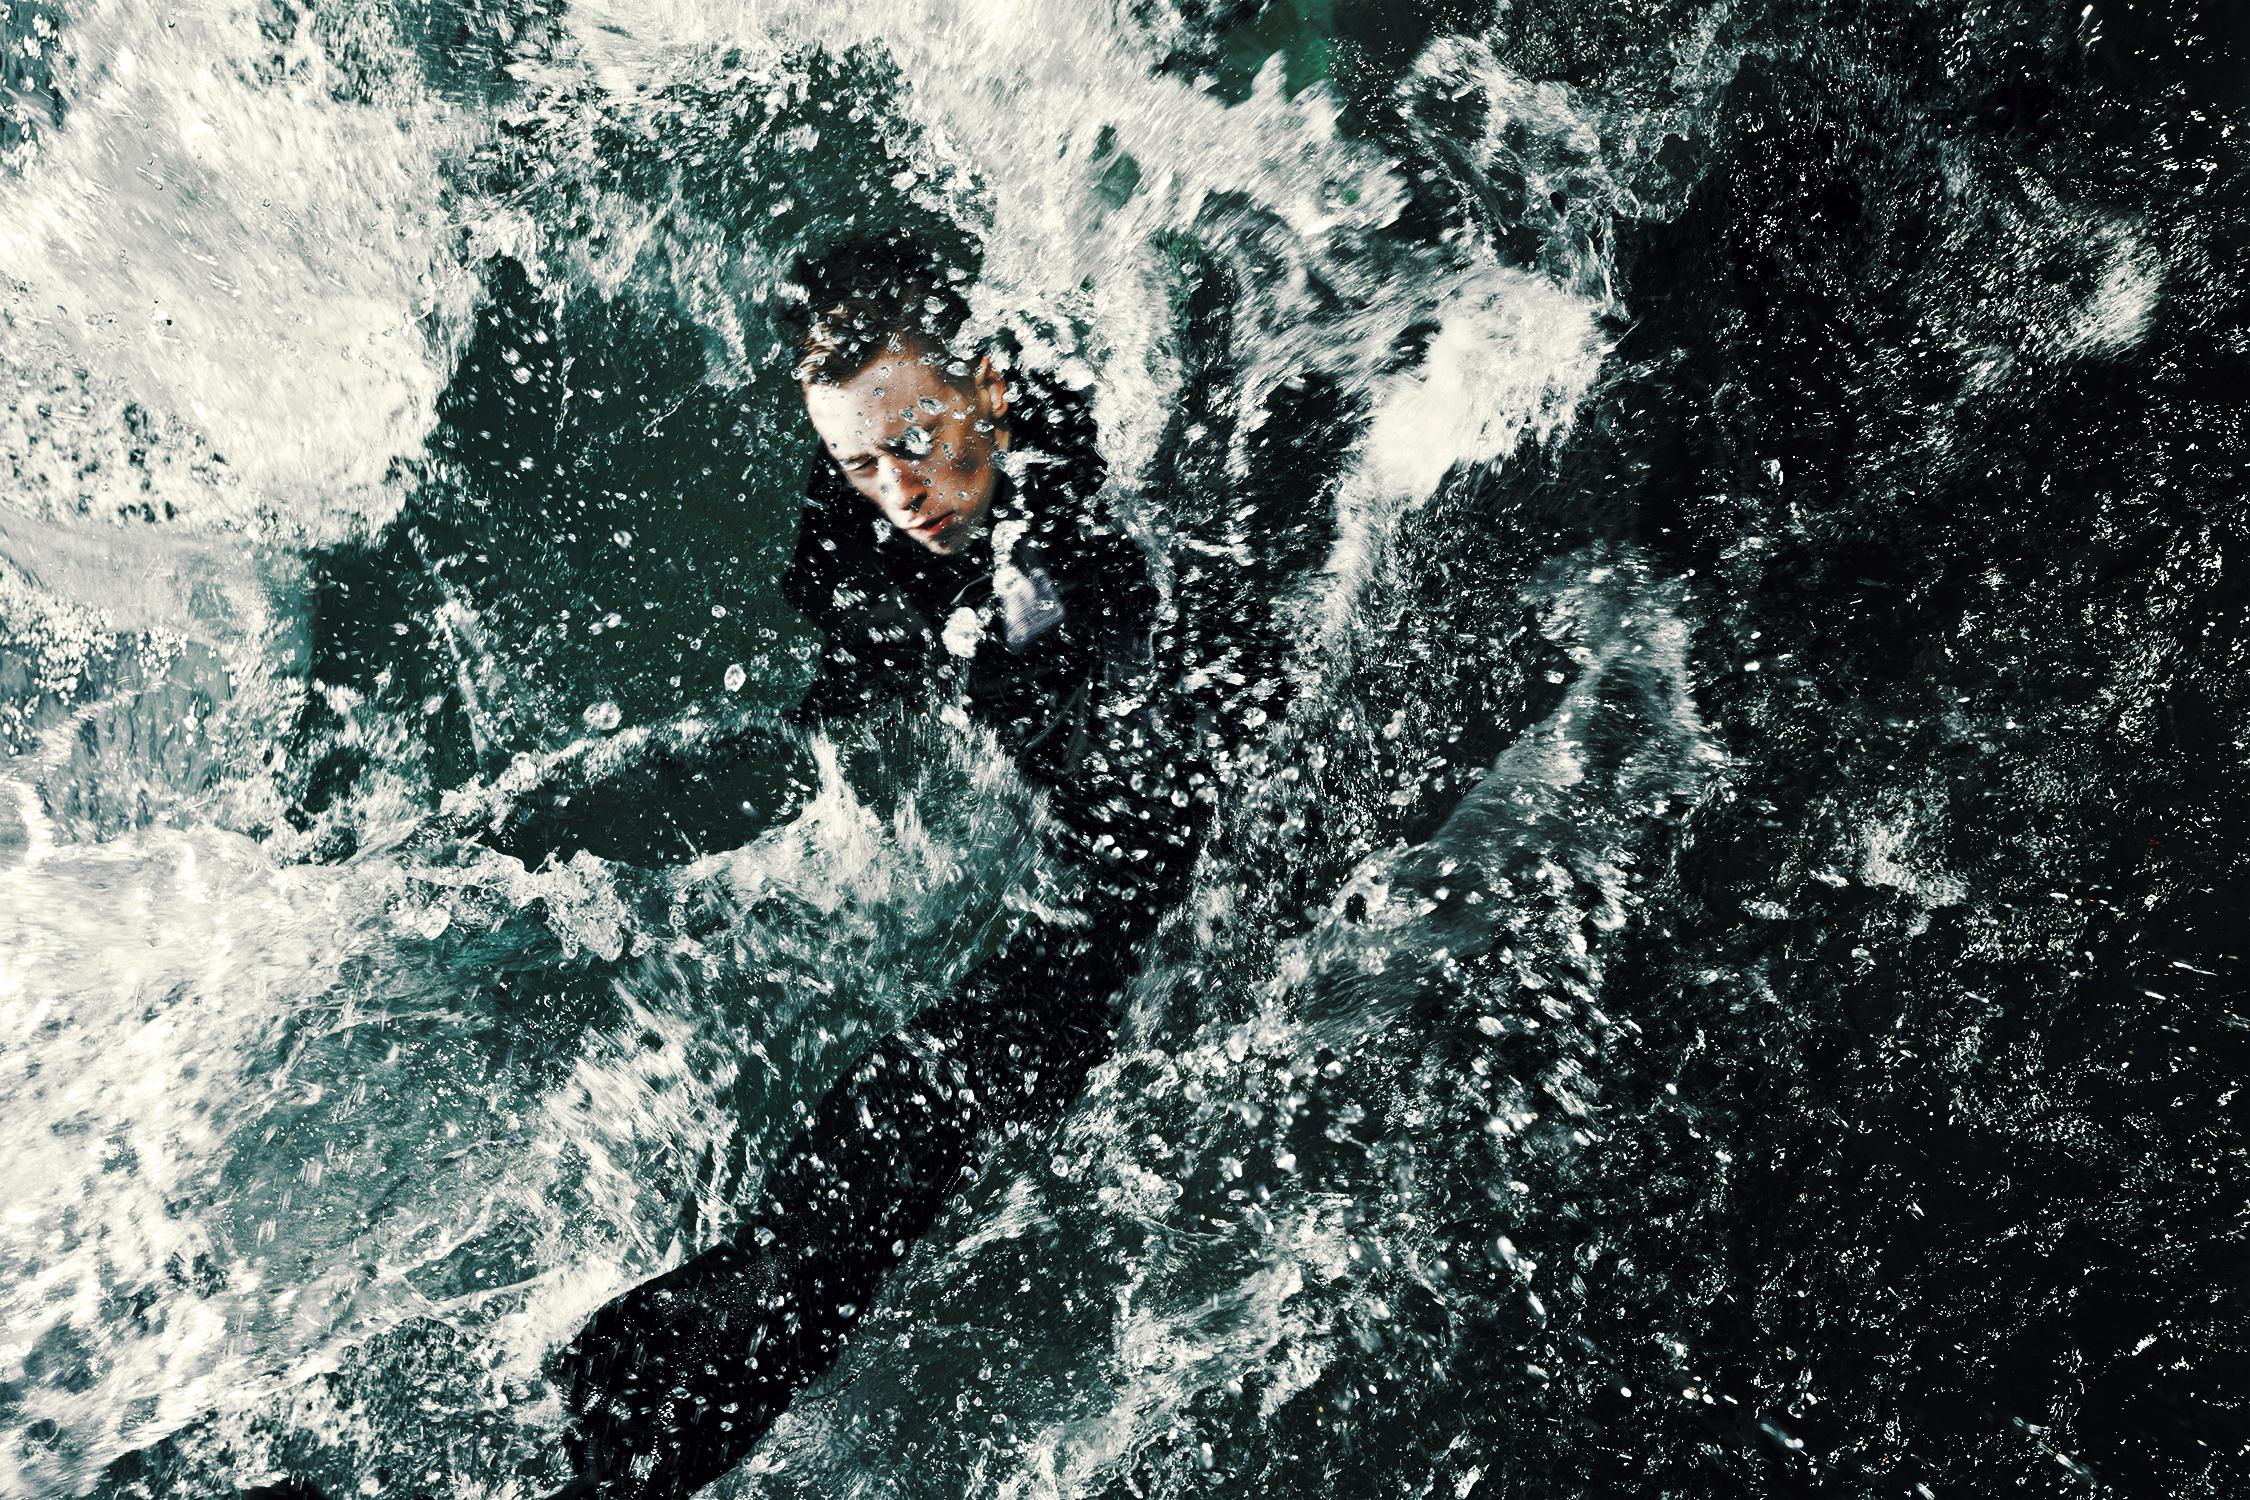 James_Bond_toiminta-elokuva-ammuttu-tippuu-veteen.jpg